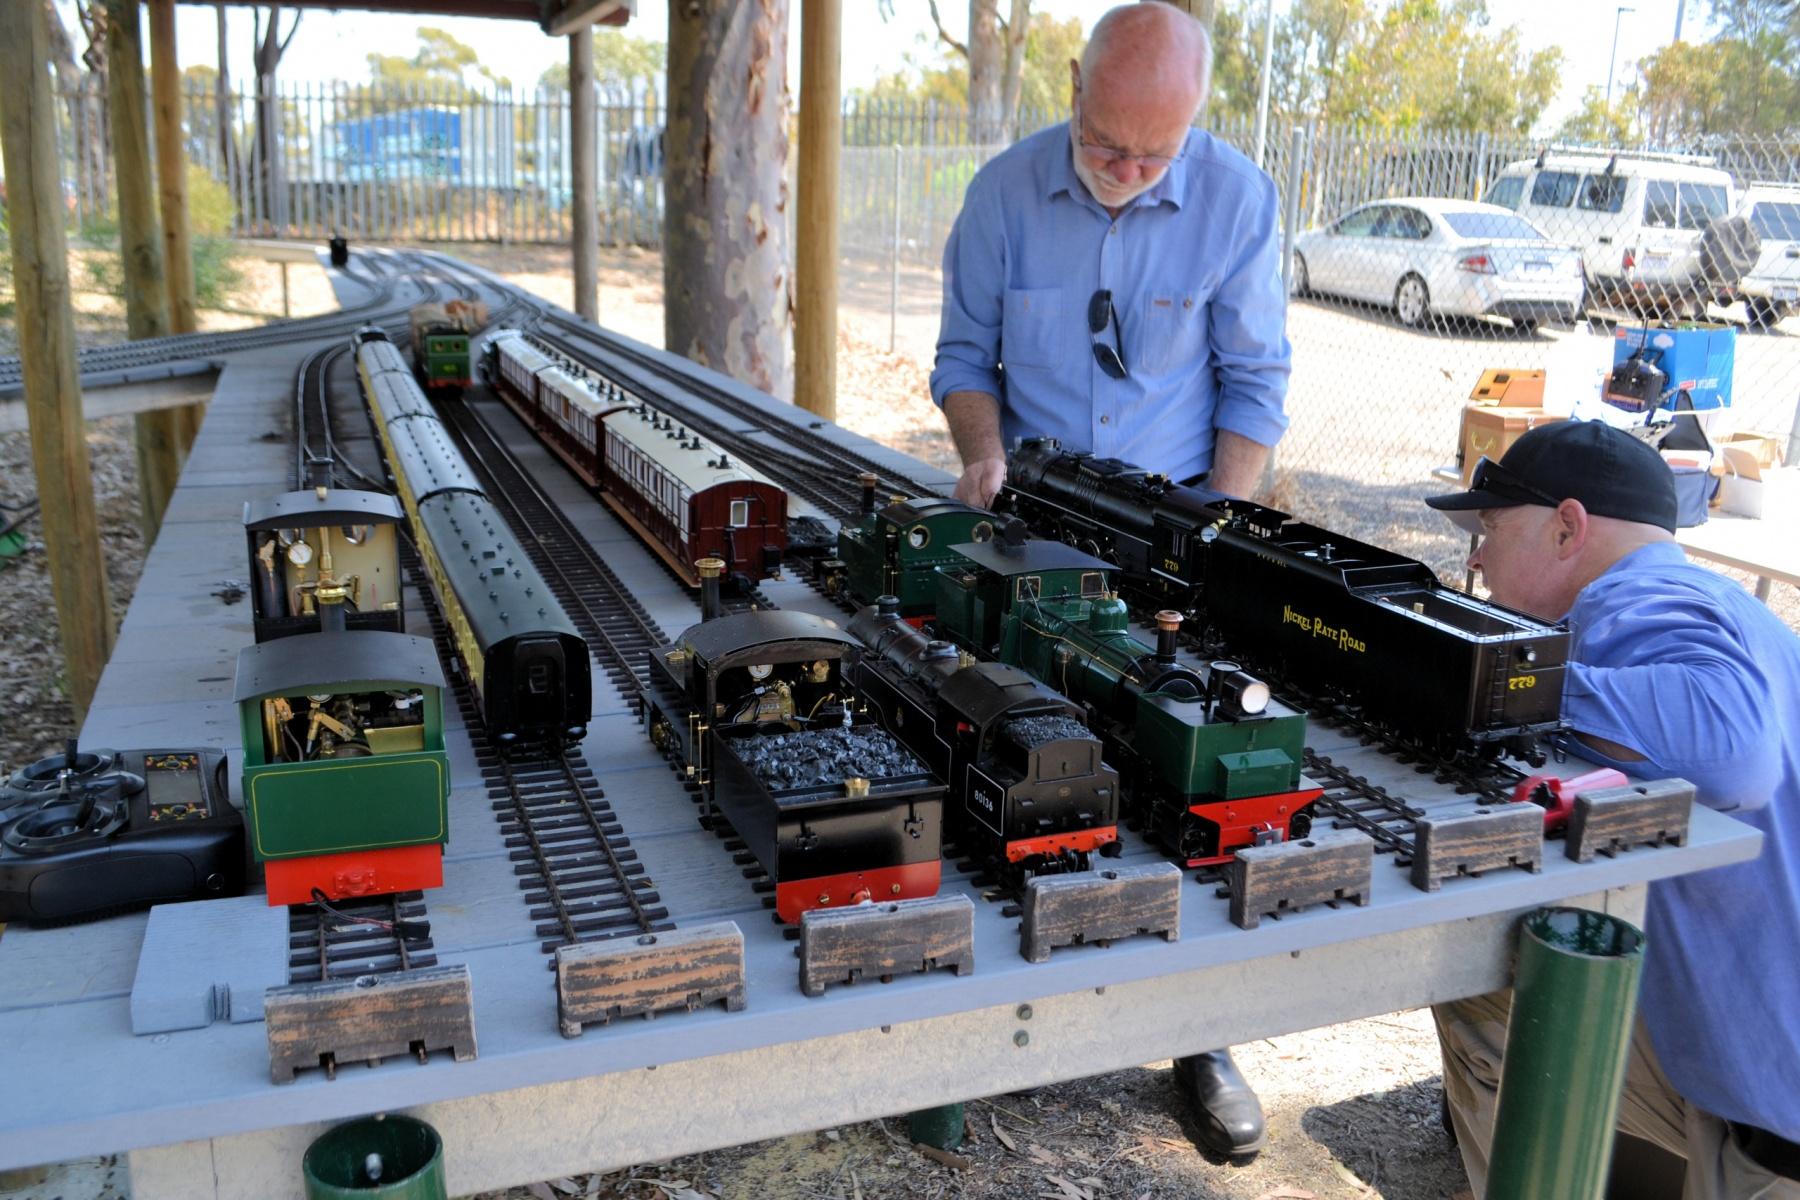 Garden-railway-open-day-Oct-21-2020-034-scaled